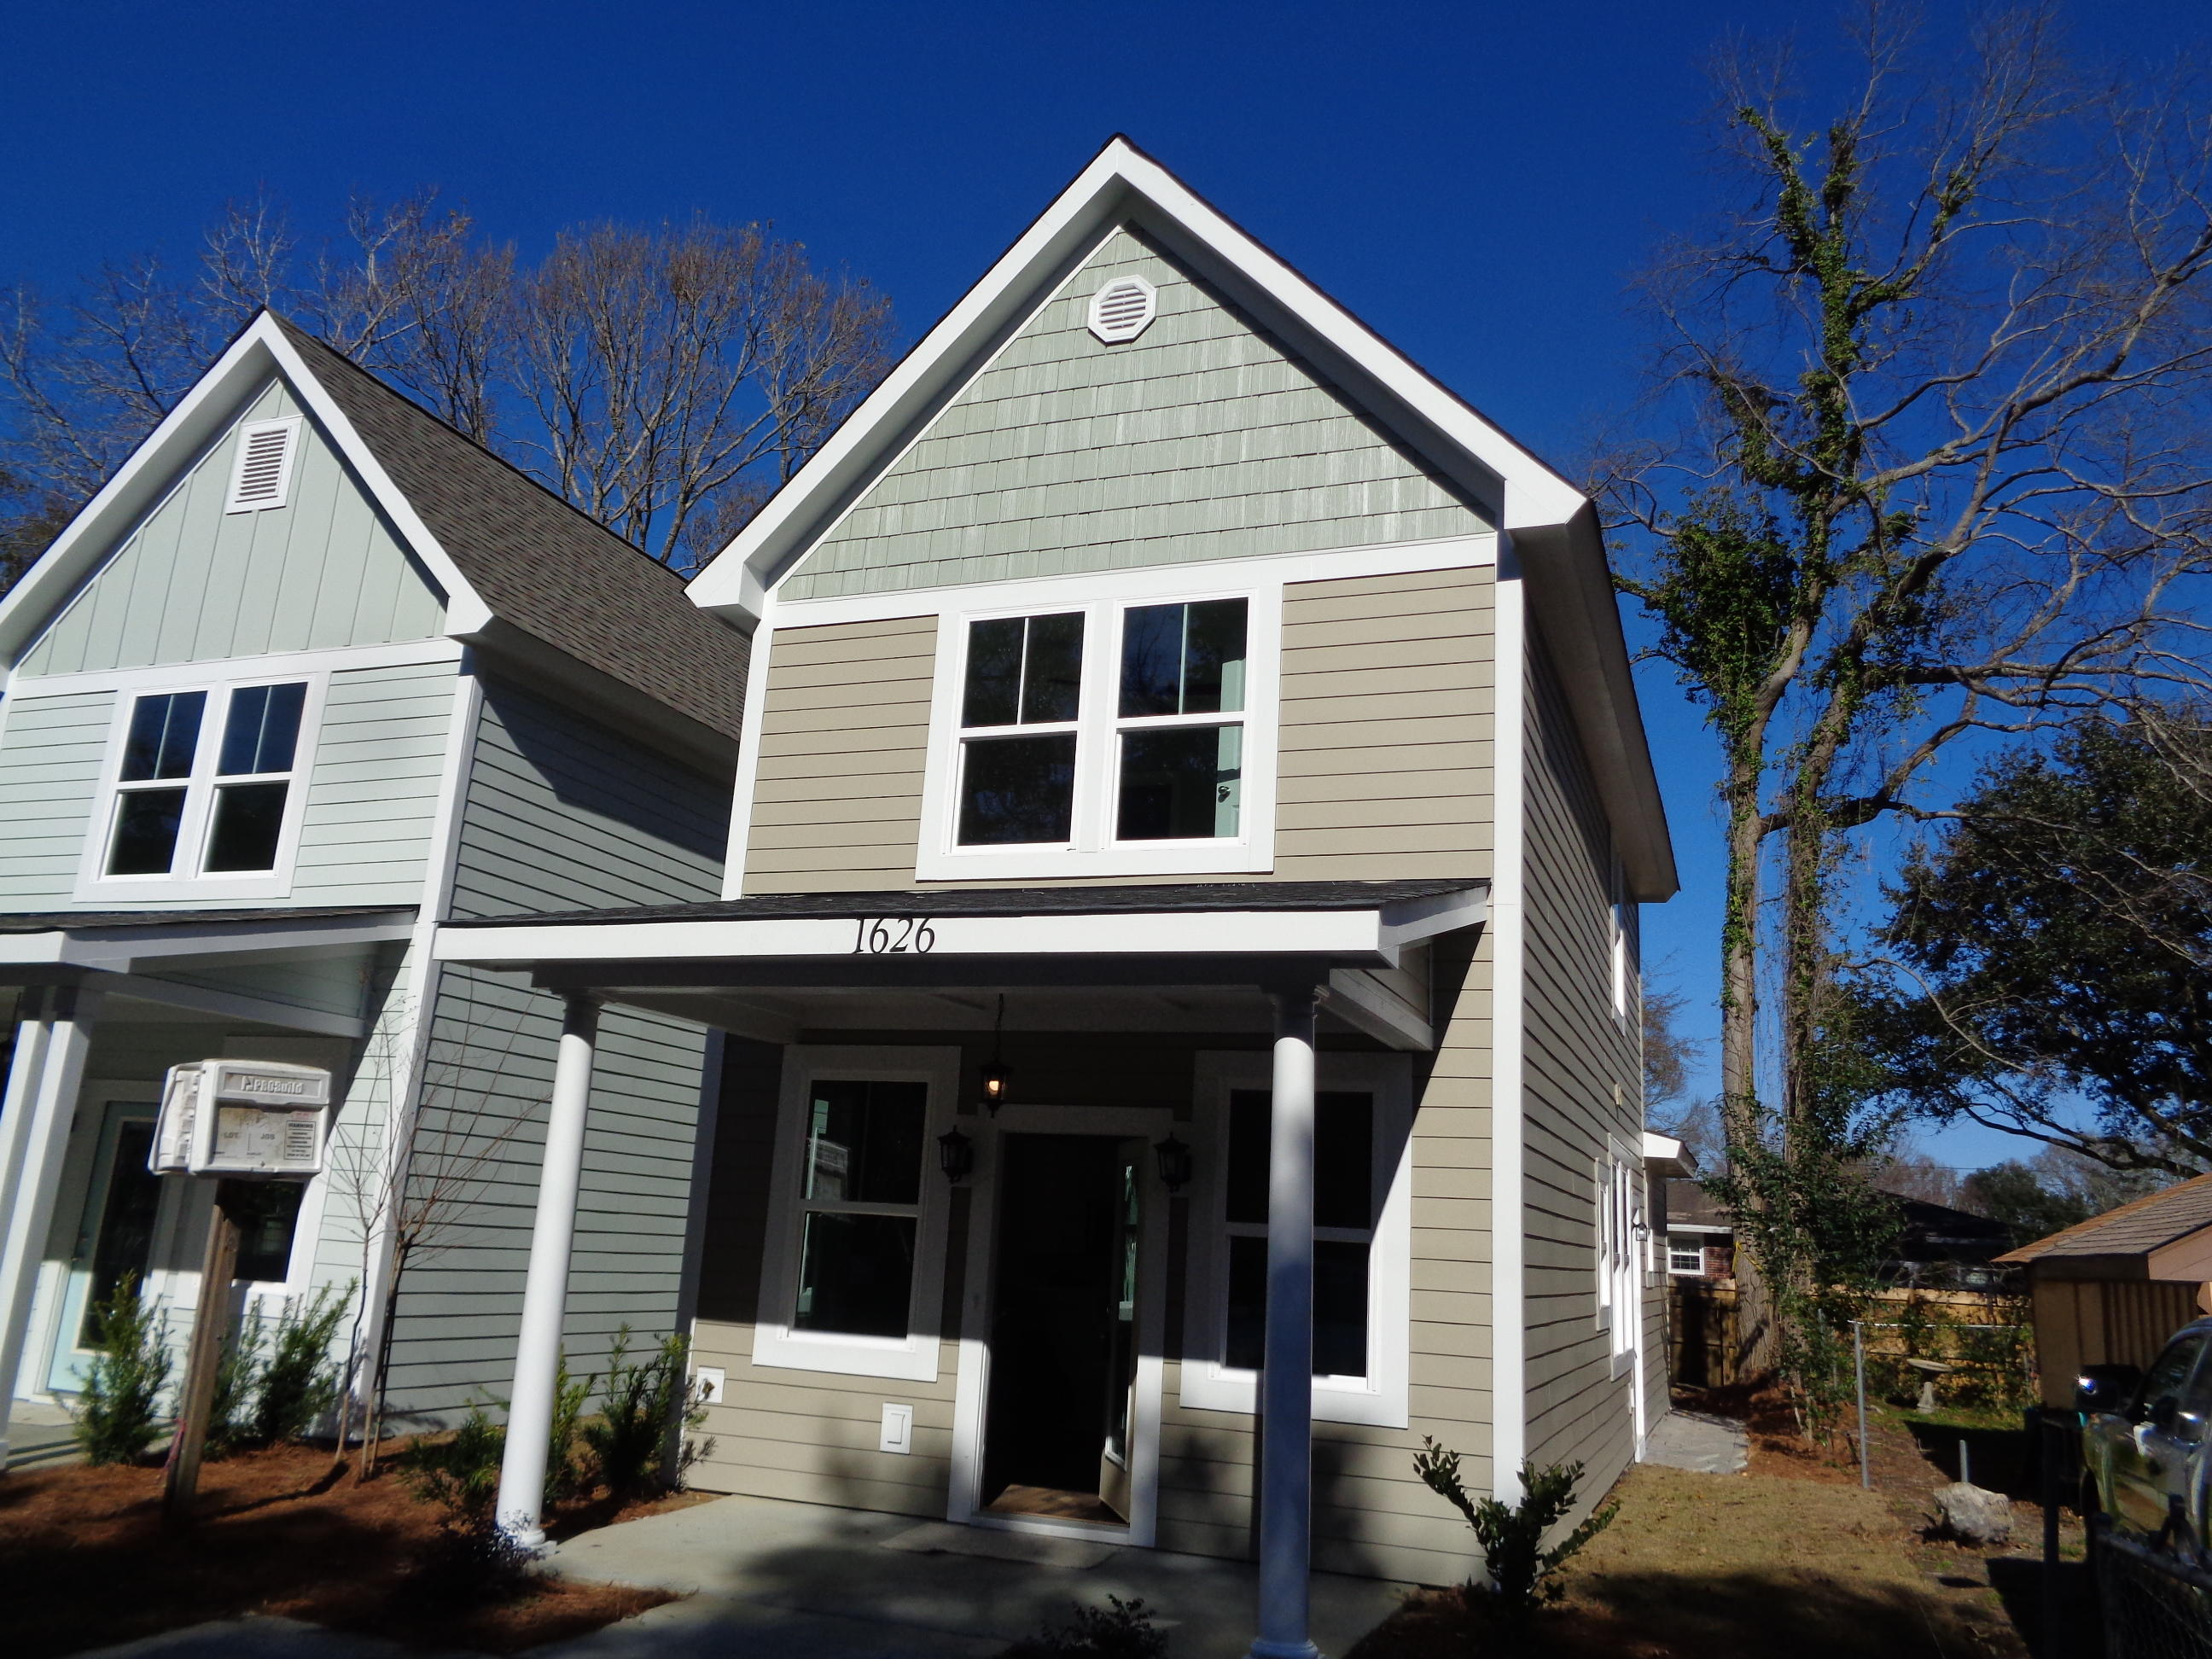 Pinecrest Gardens Homes For Sale - 1626 Wappoo, Charleston, SC - 25